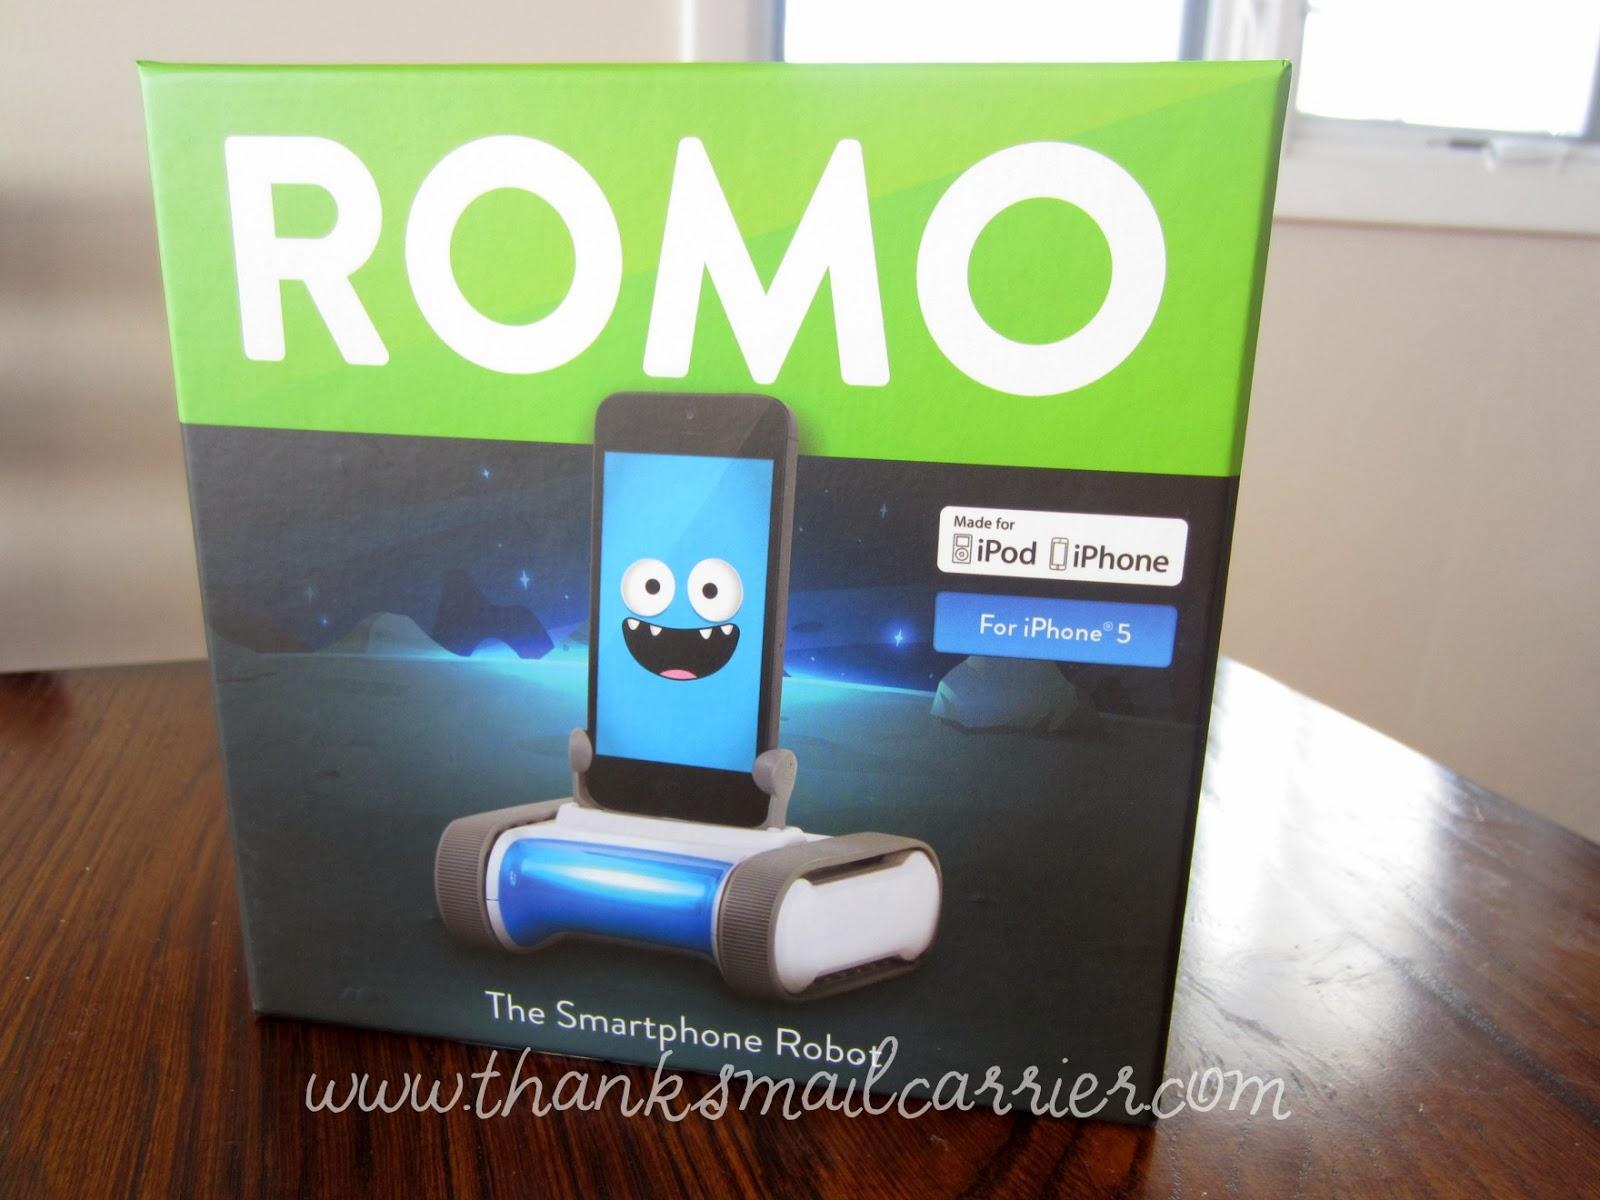 Romo personal robot